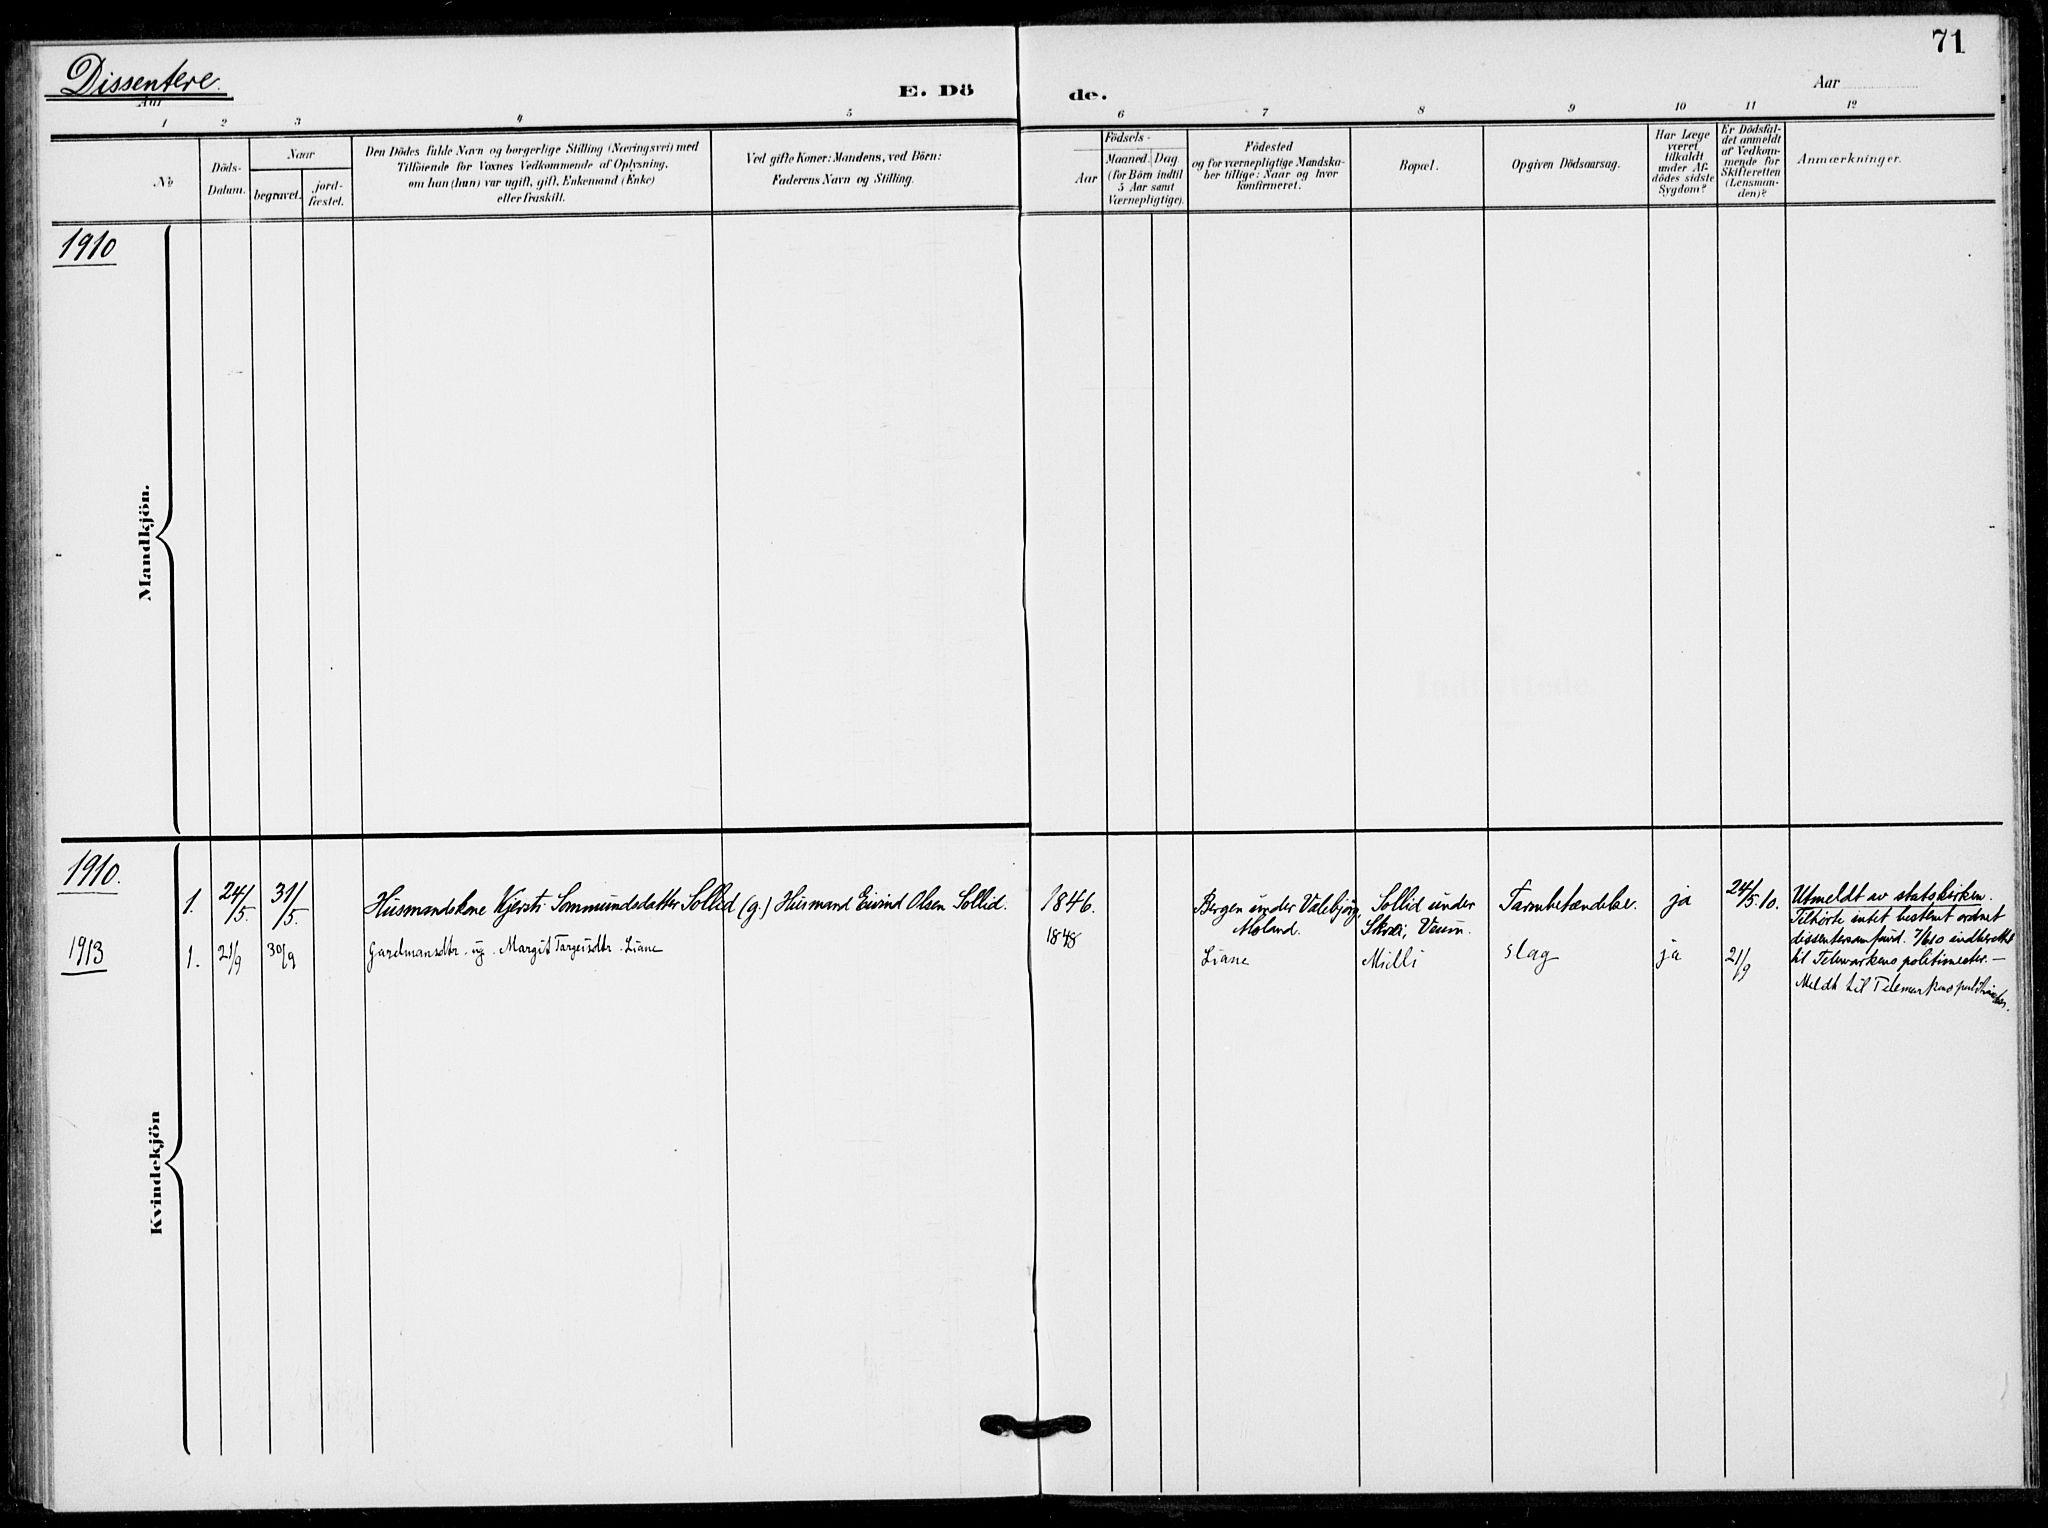 SAKO, Fyresdal kirkebøker, F/Fb/L0004: Ministerialbok nr. II 4, 1903-1920, s. 71